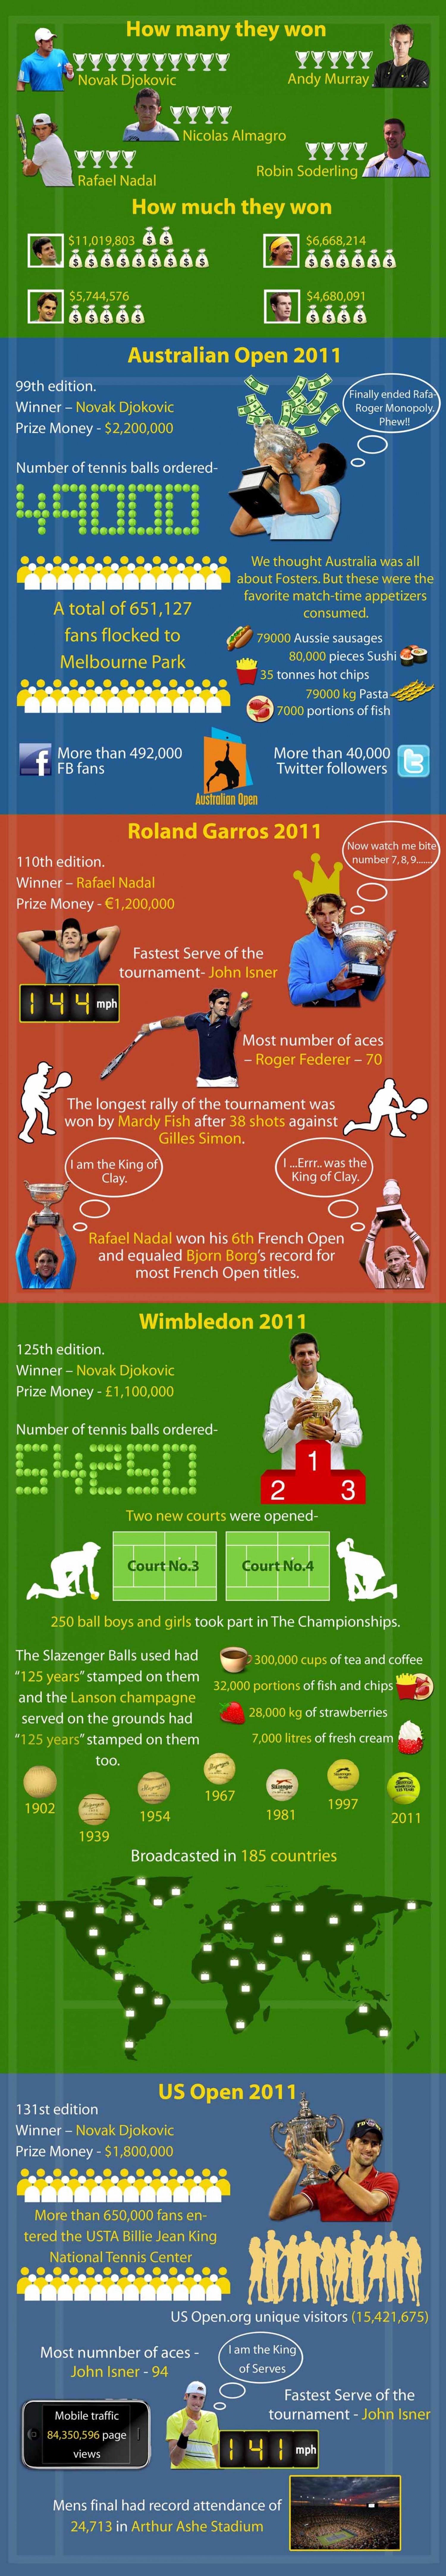 5. Grand Slam Illustrated